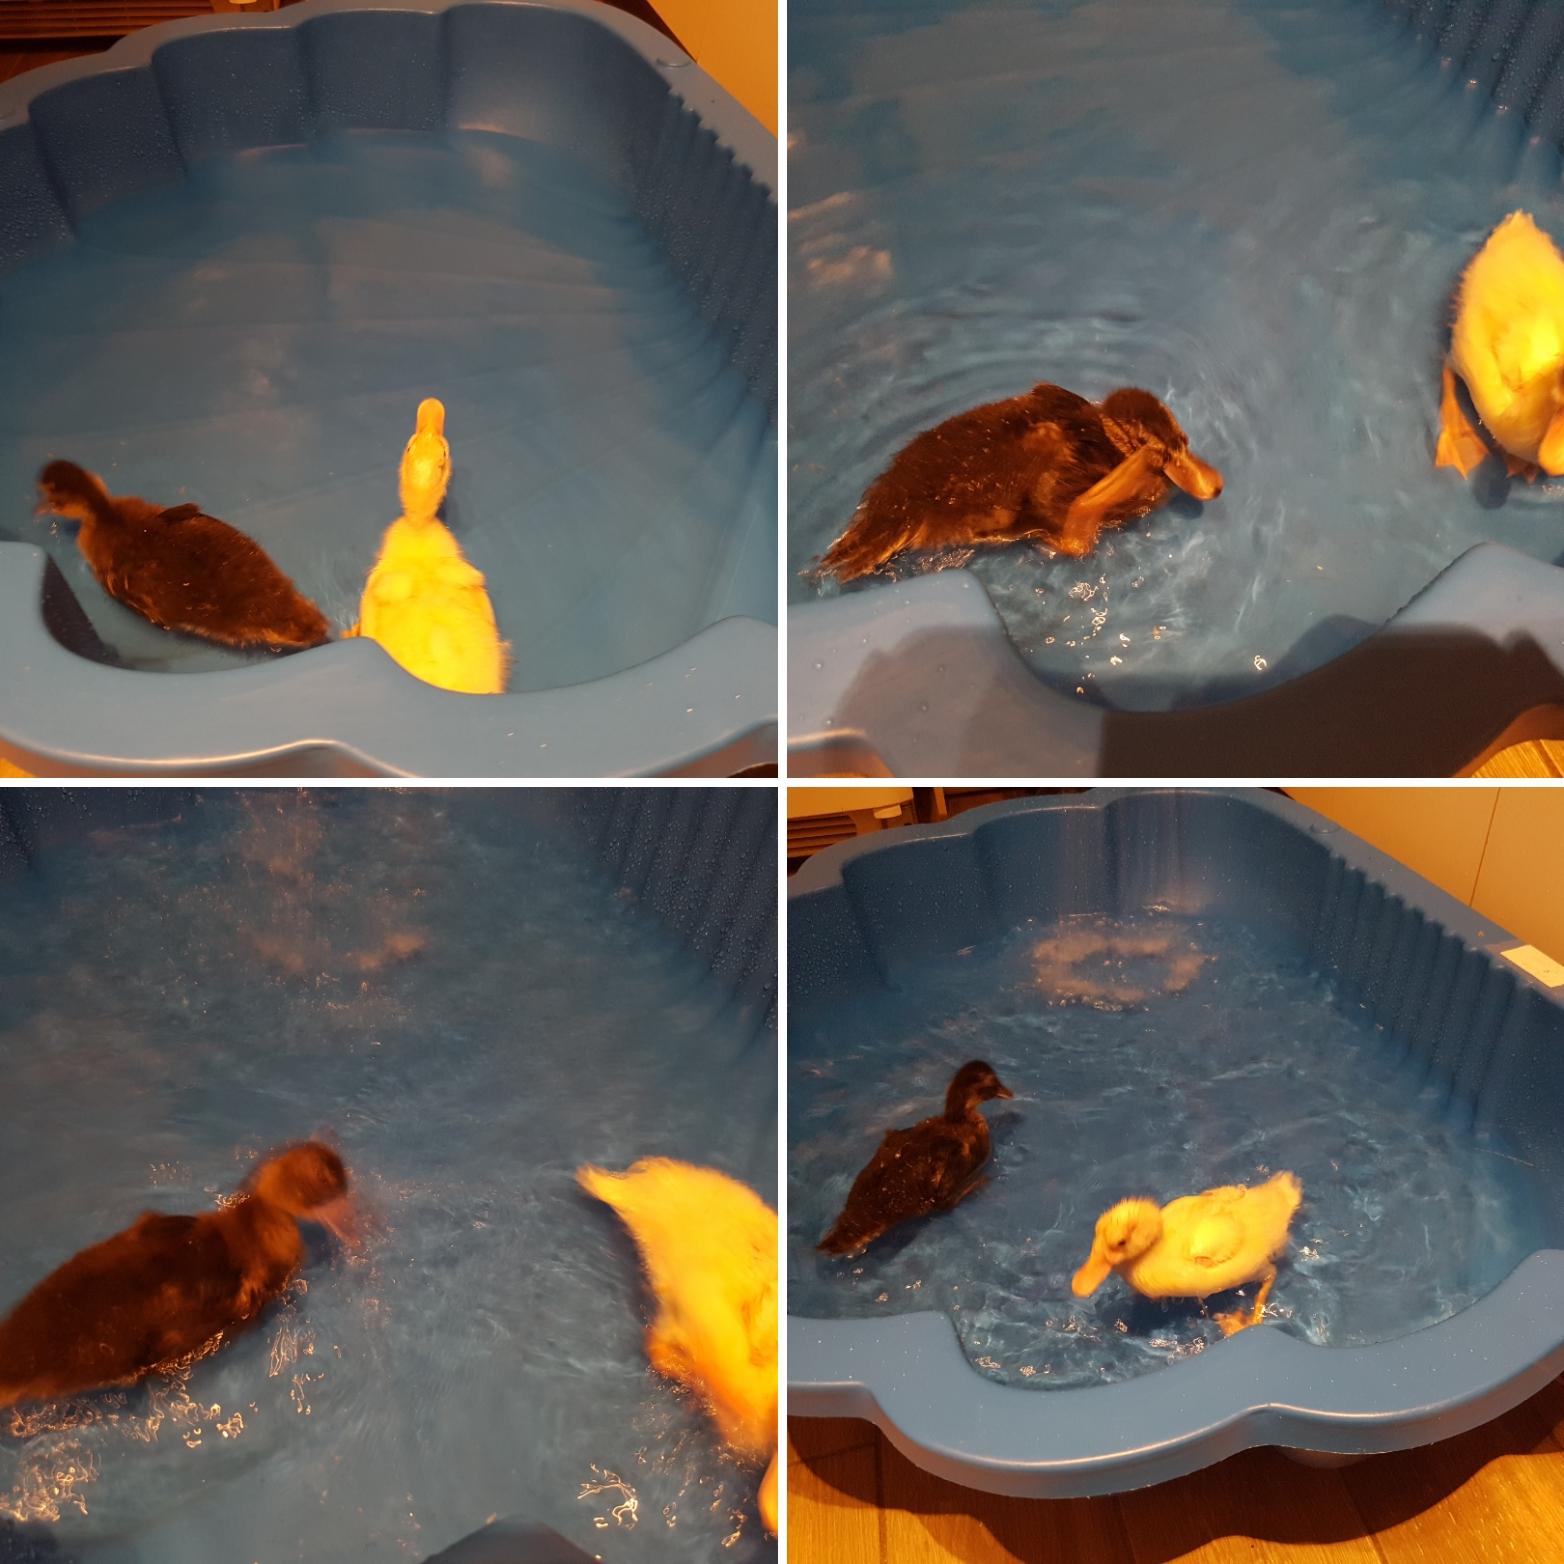 Sauvetage d'animaux